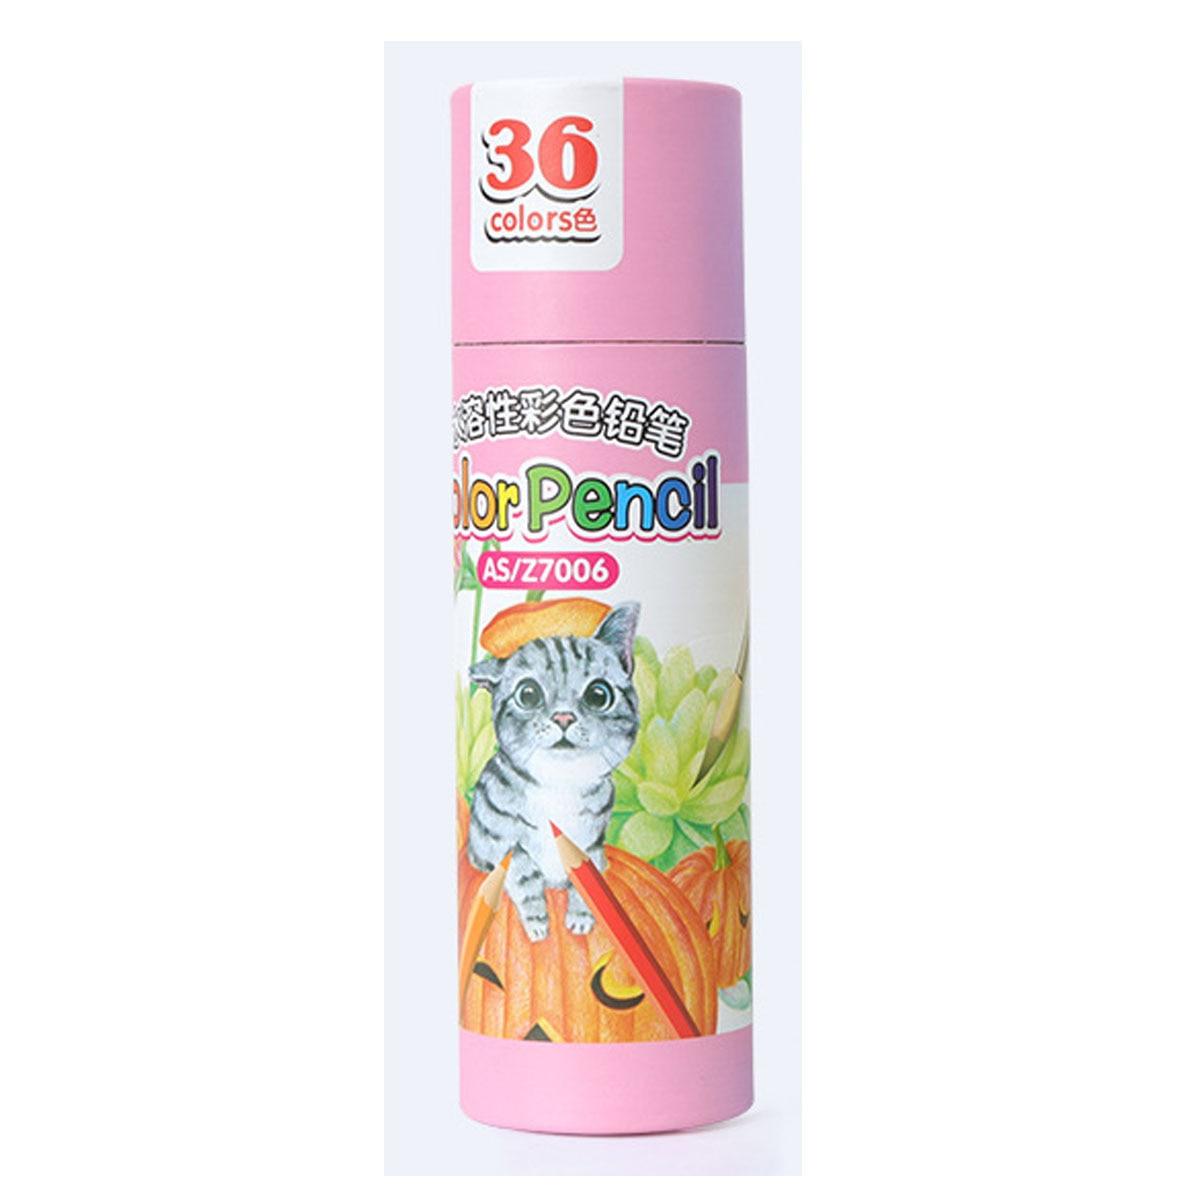 36 colores seguro no tóxico plomo Soluble en agua lápiz de color acuarela Juego de lápices para escritura dibujo arte suministros rosa